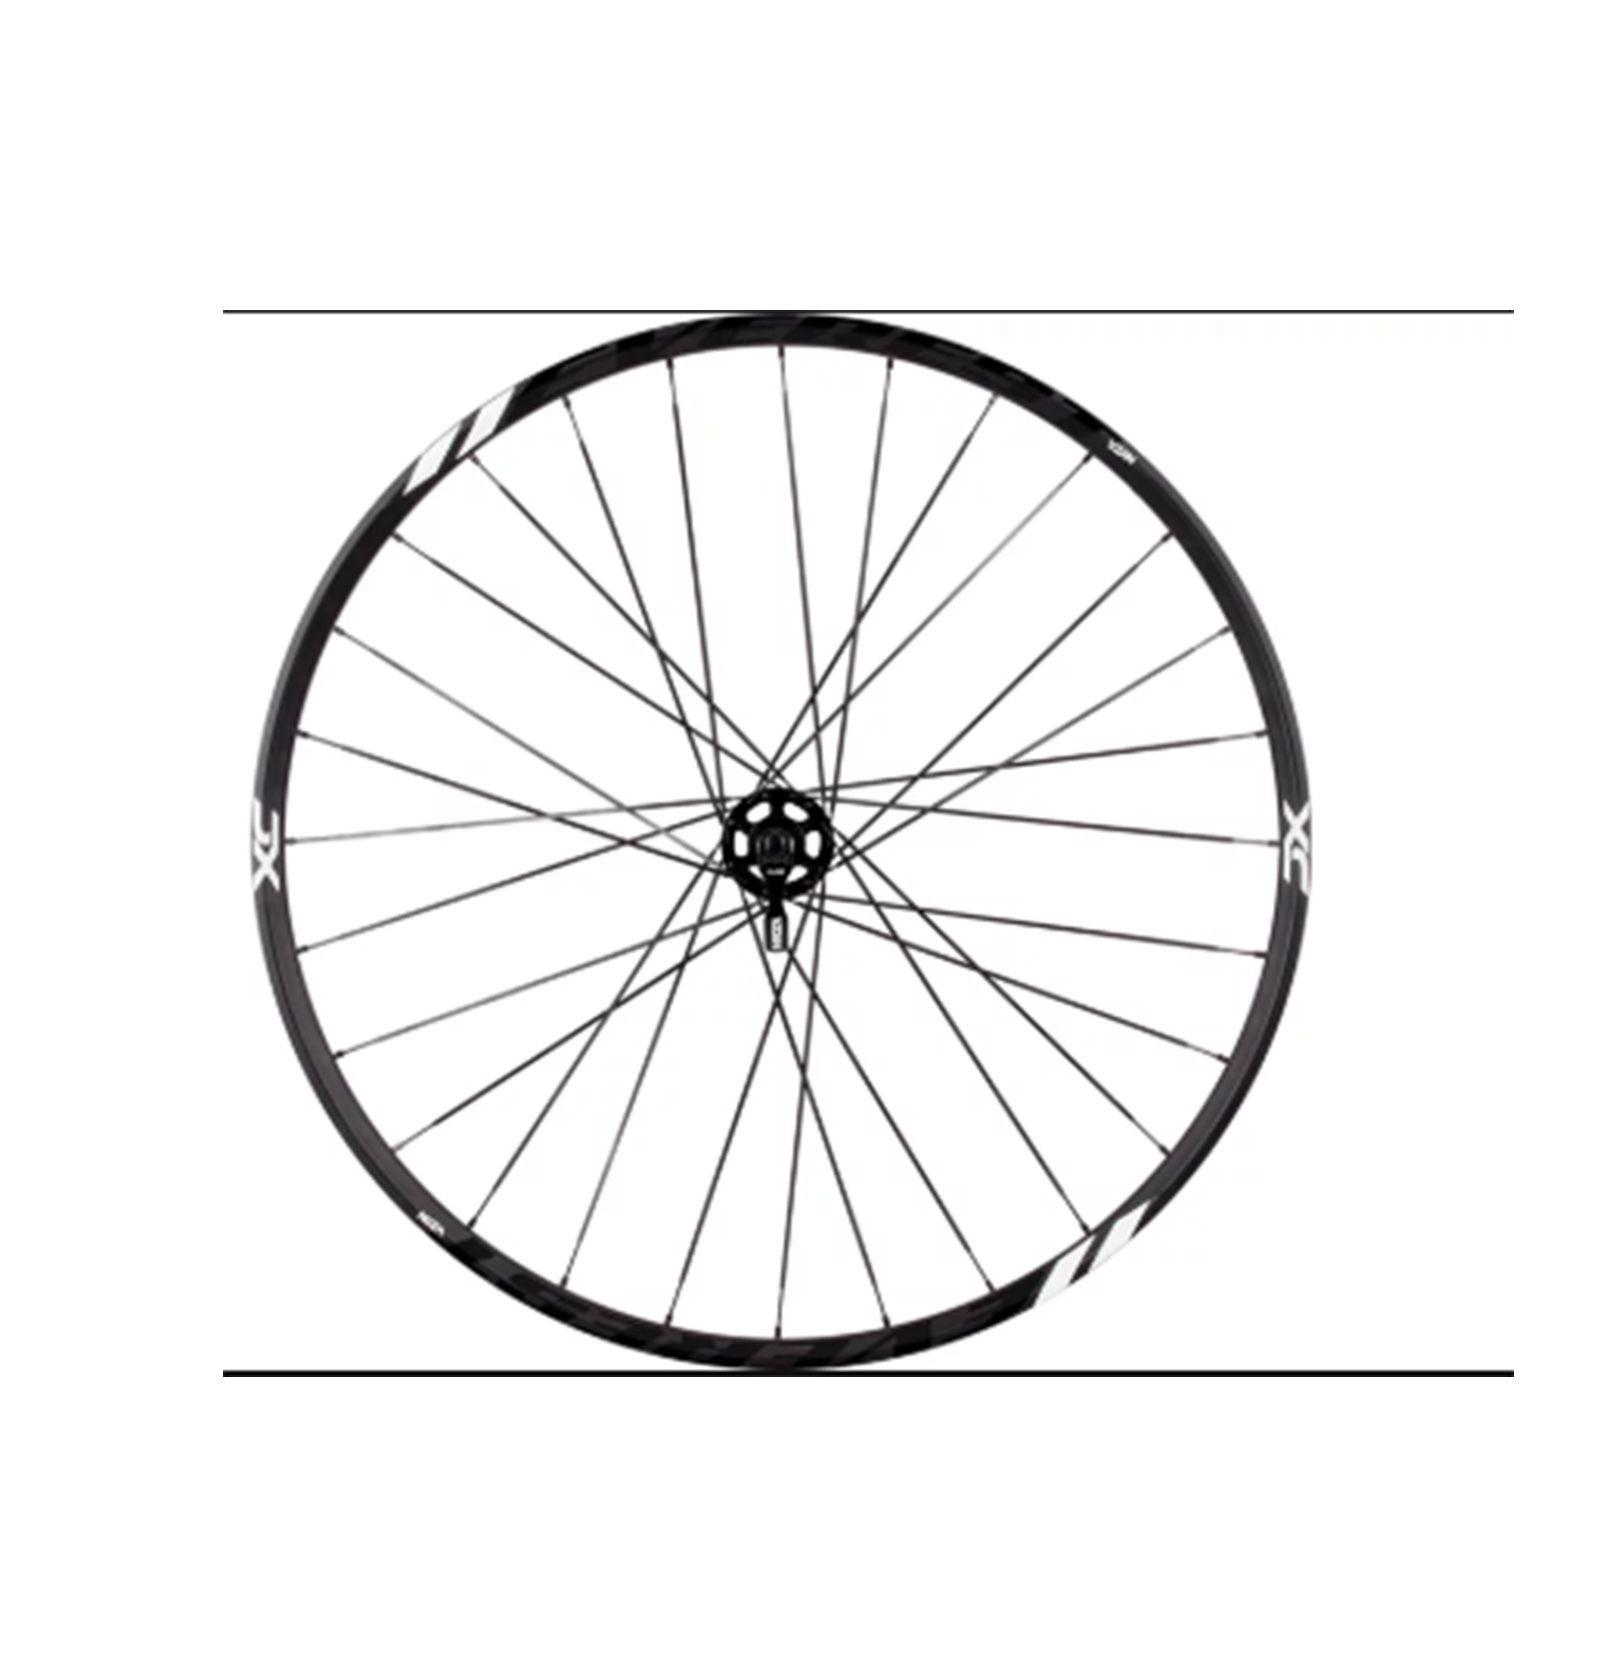 Roda Everest XC 29 Preto Compatível Shimano - VZAN